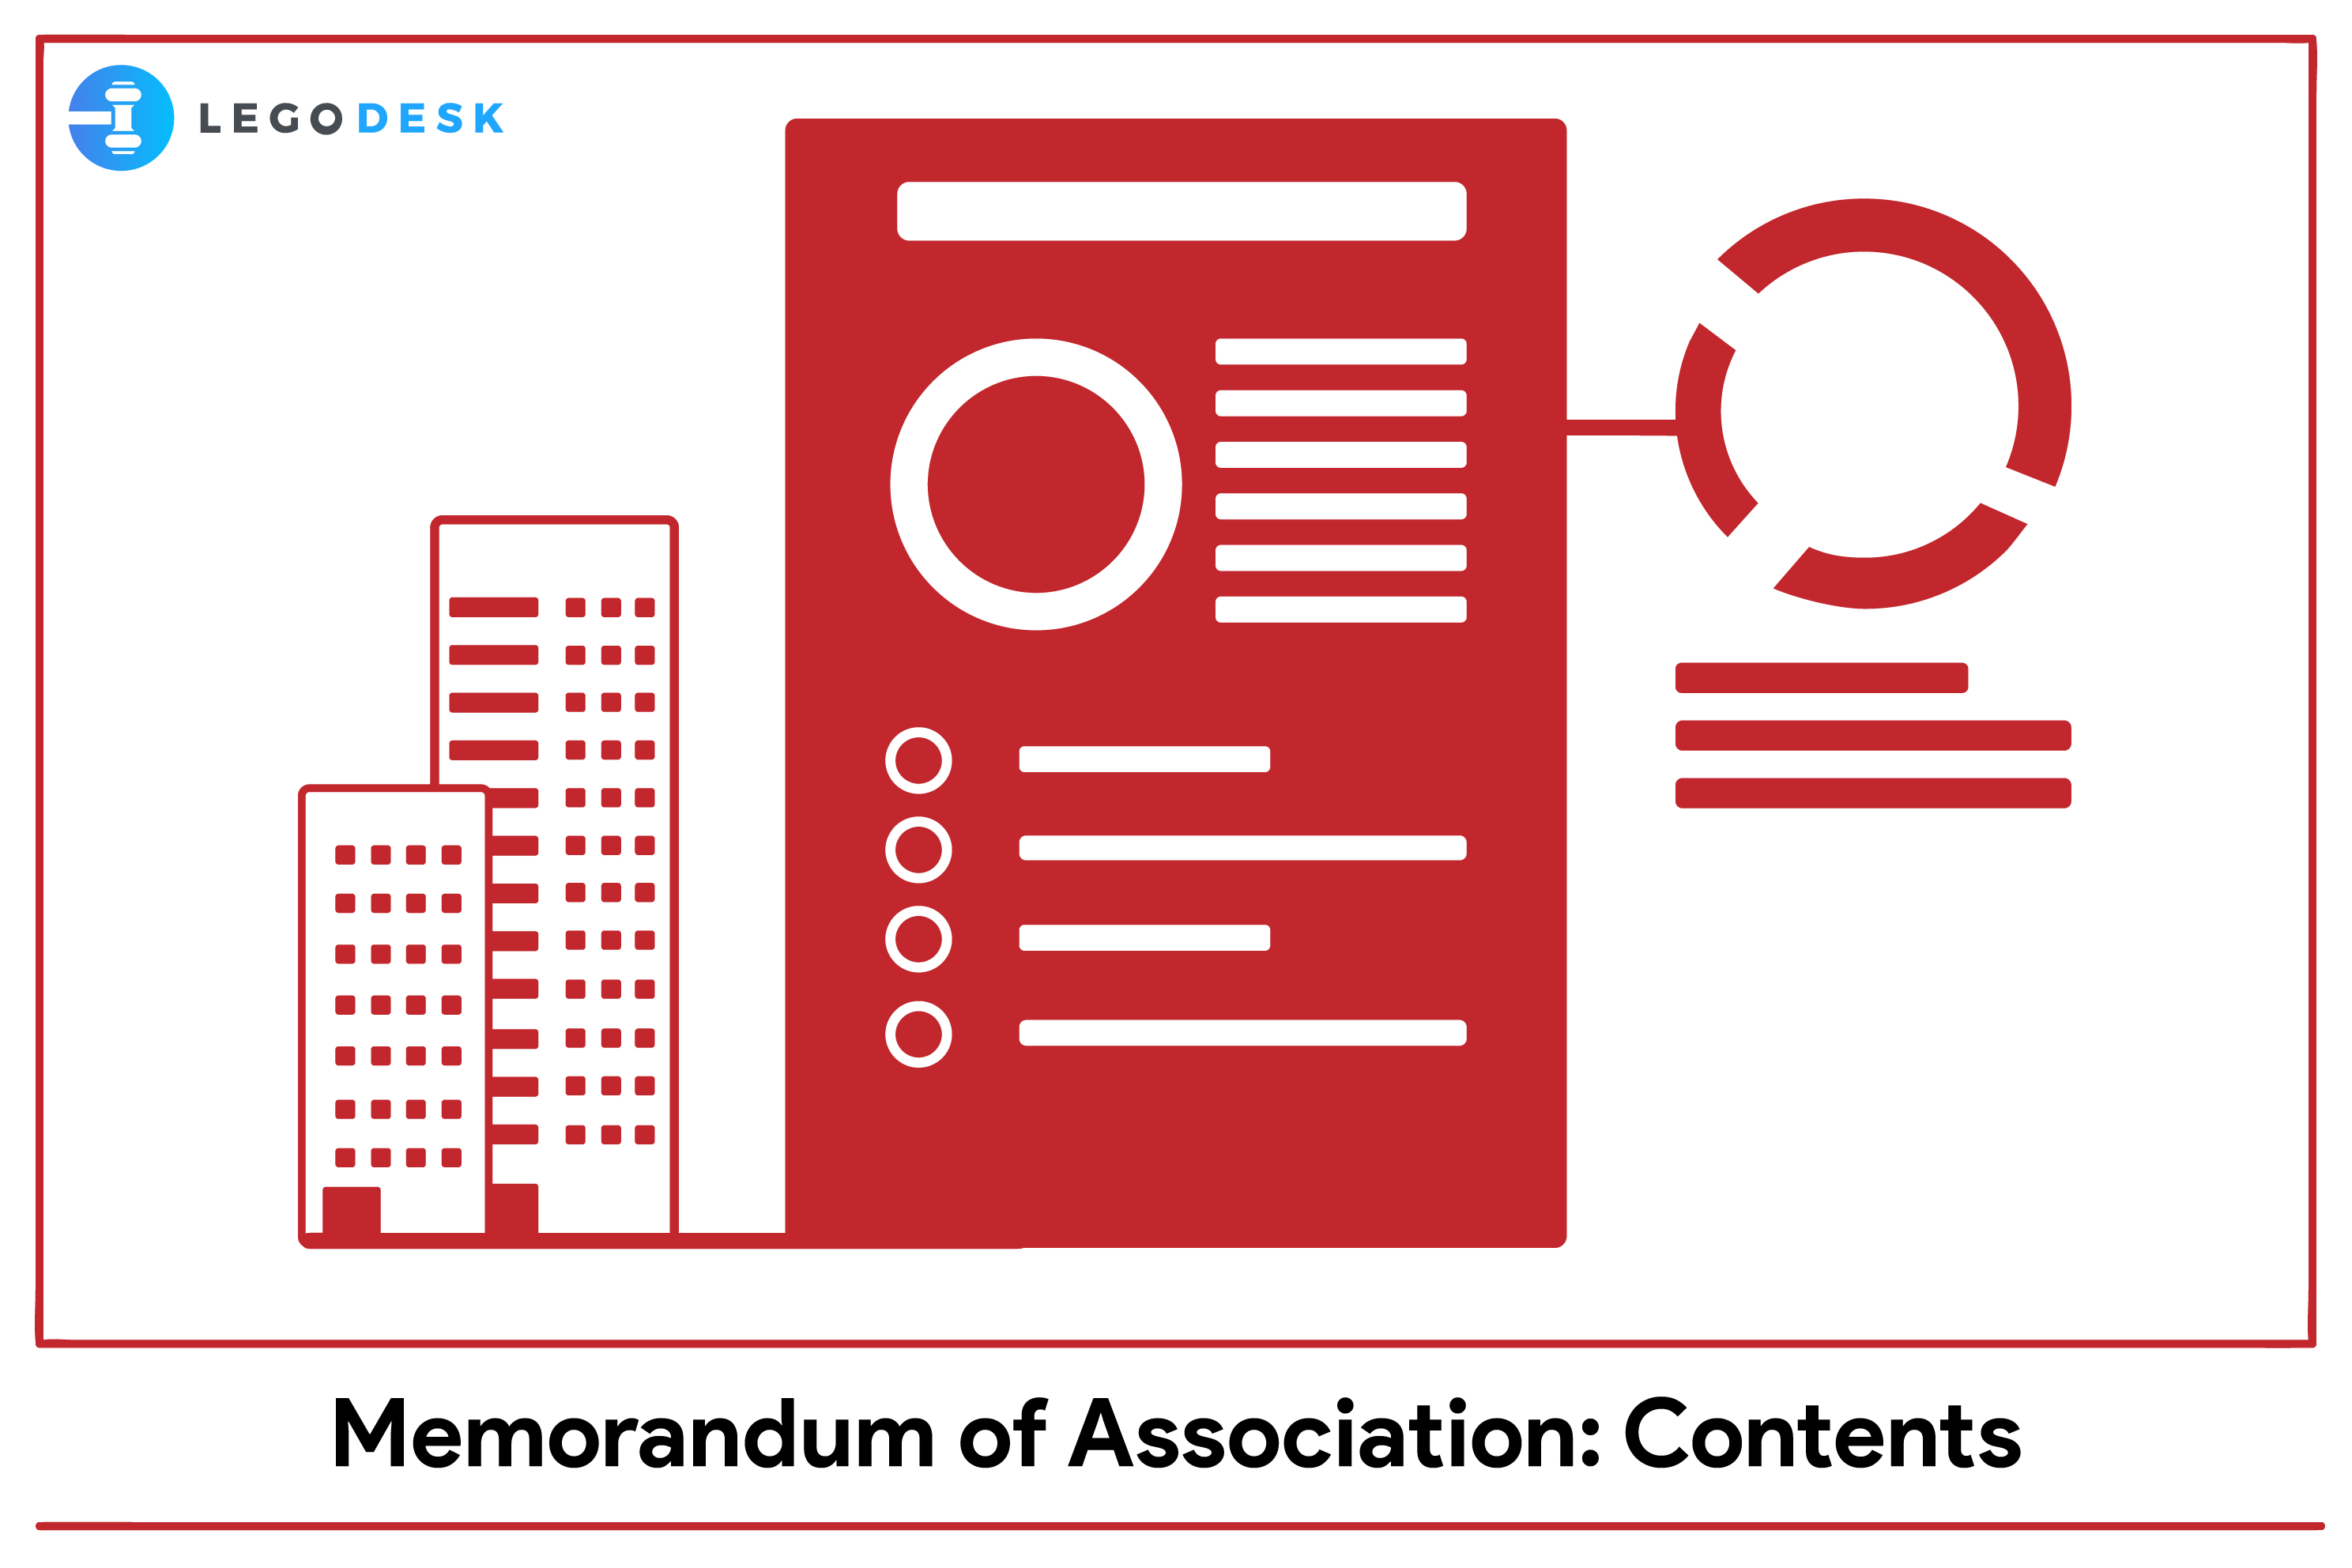 Memorandum of Association: Contents